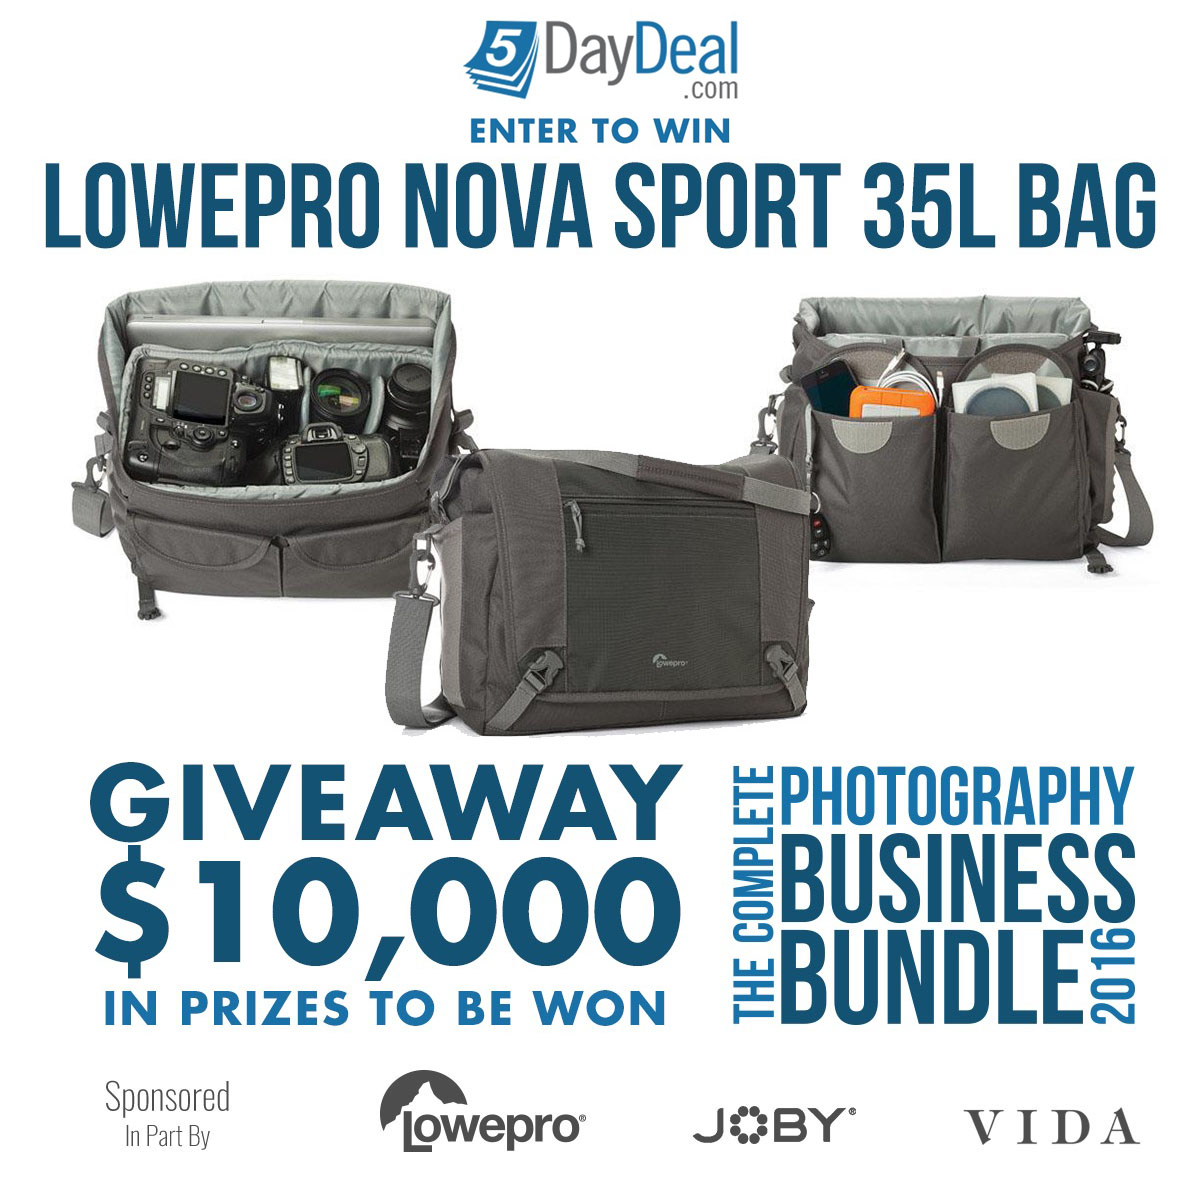 GIVEAWAYGRAPHIC_Lowepro-Nova-Sport